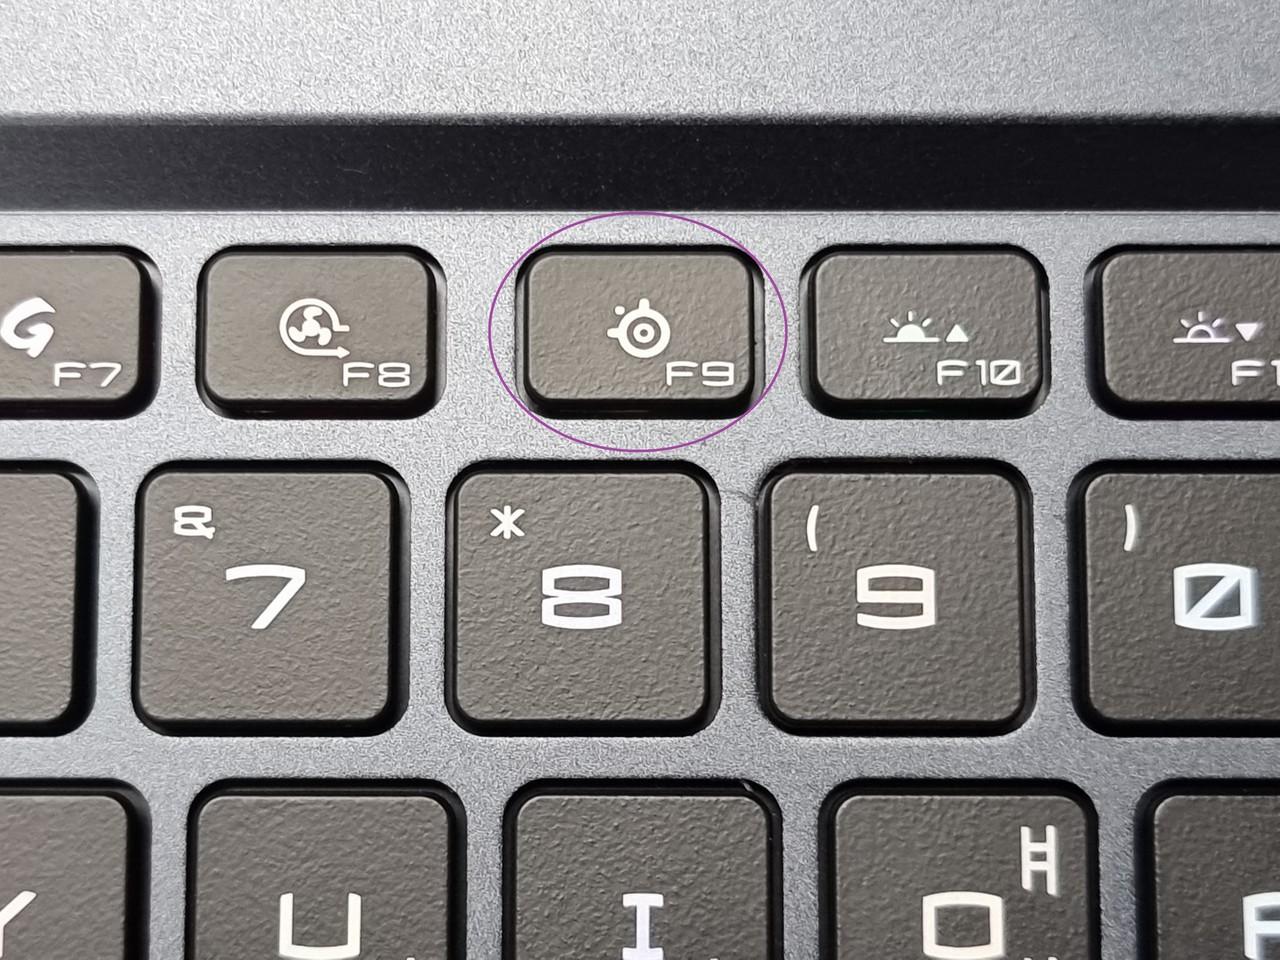 ▲ F9키(스틸시리즈)를 통해 키보드 RGB 프리셋을 변경할 수 있다.